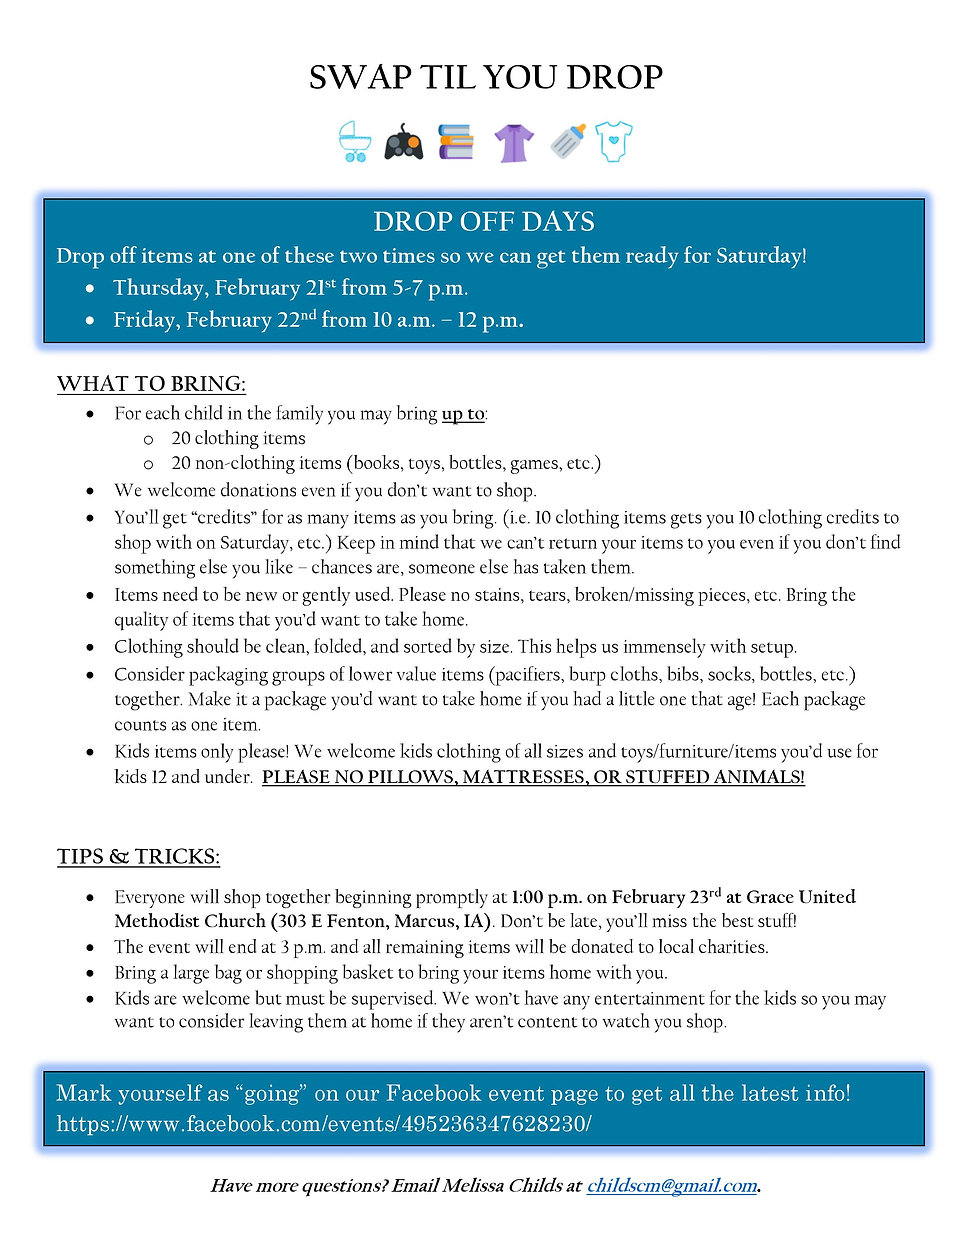 Swap Til You Drop Kids Guidelines - MMCR